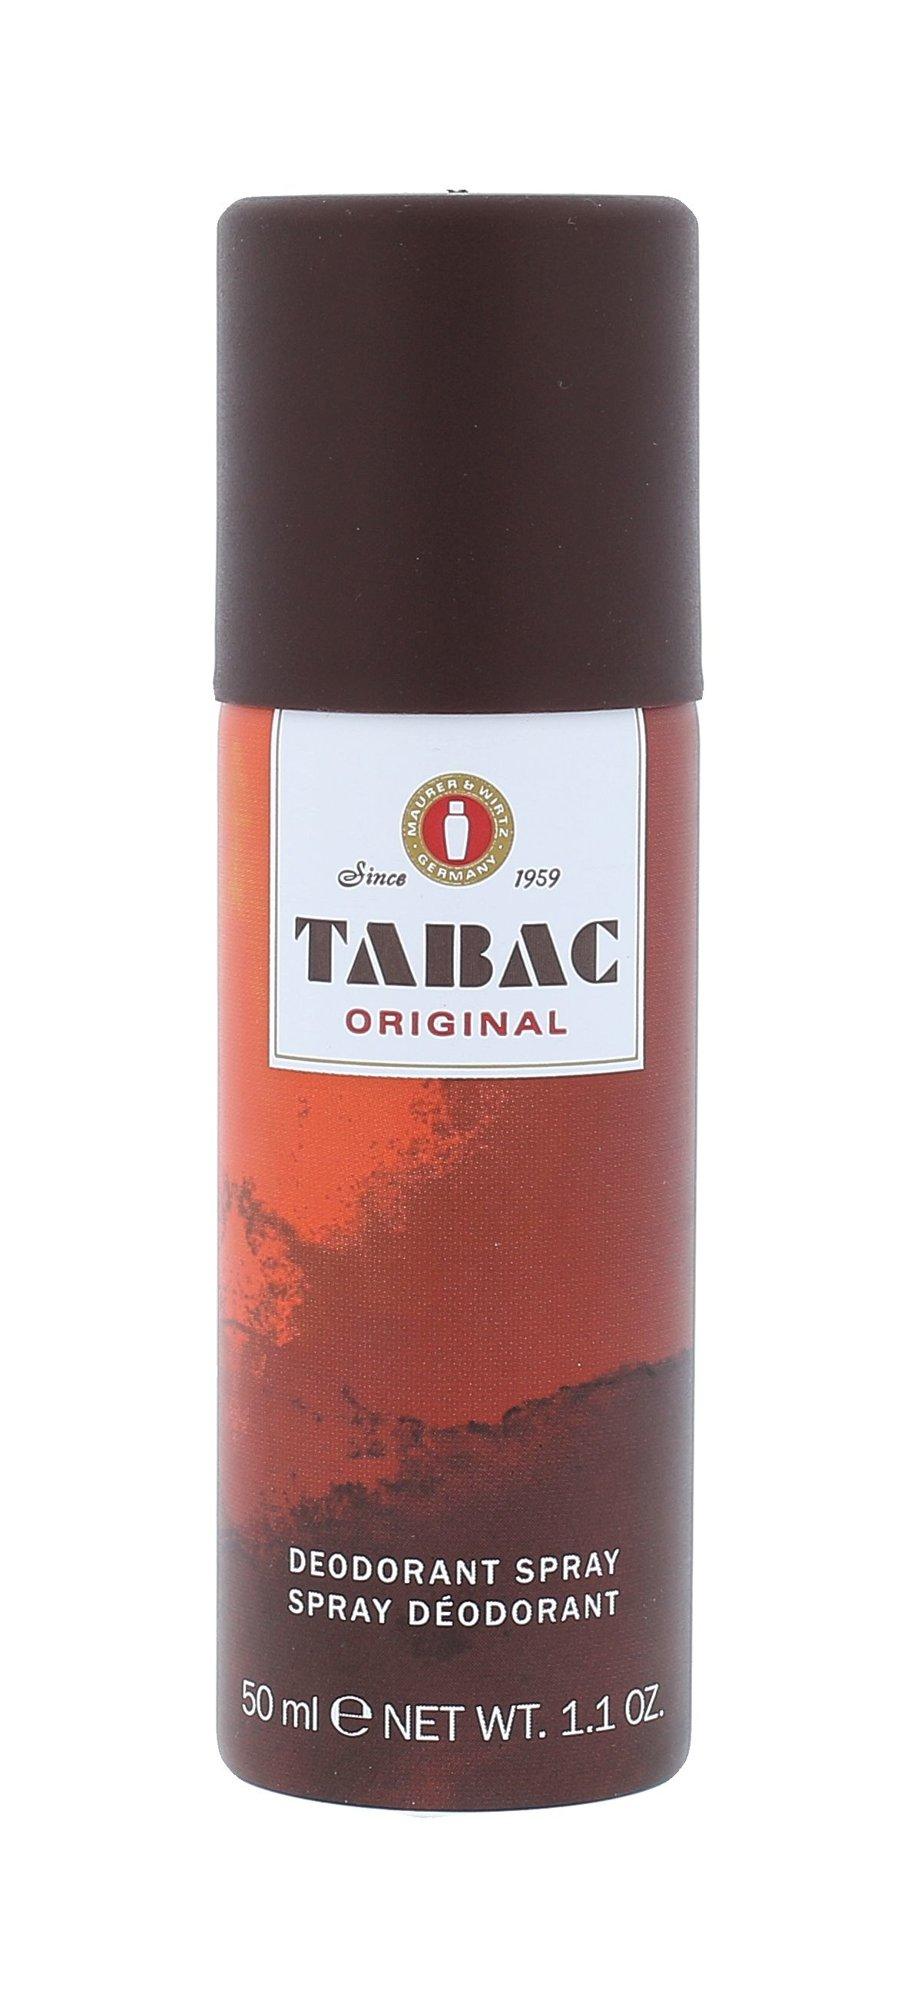 TABAC Original Deodorant 50ml